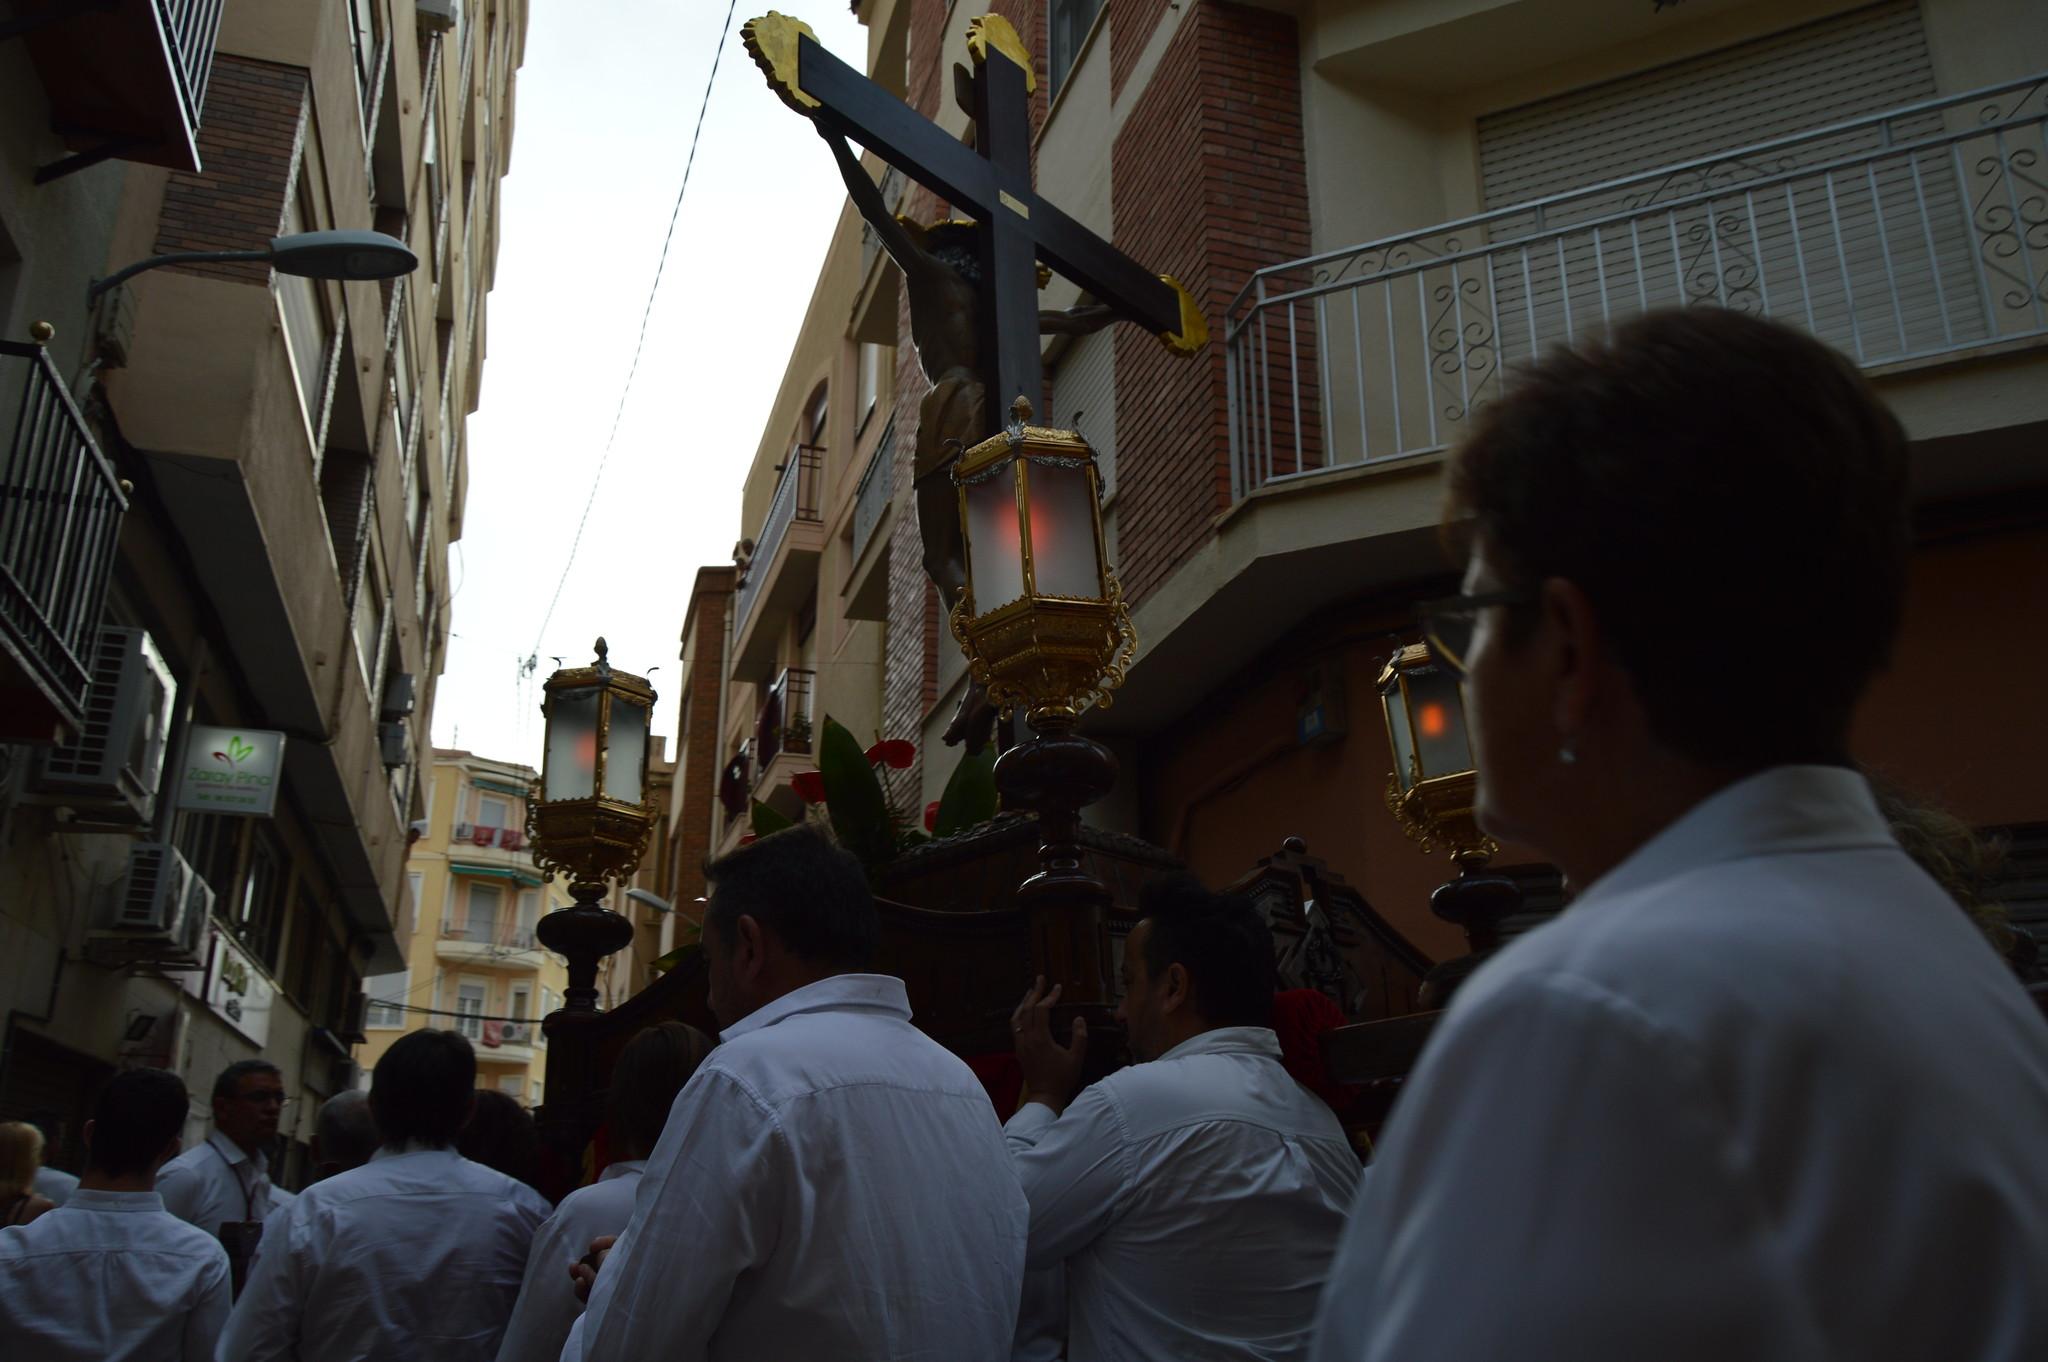 (2019-07-07) Procesión de subida - Adrián Romero Montesinos (10)